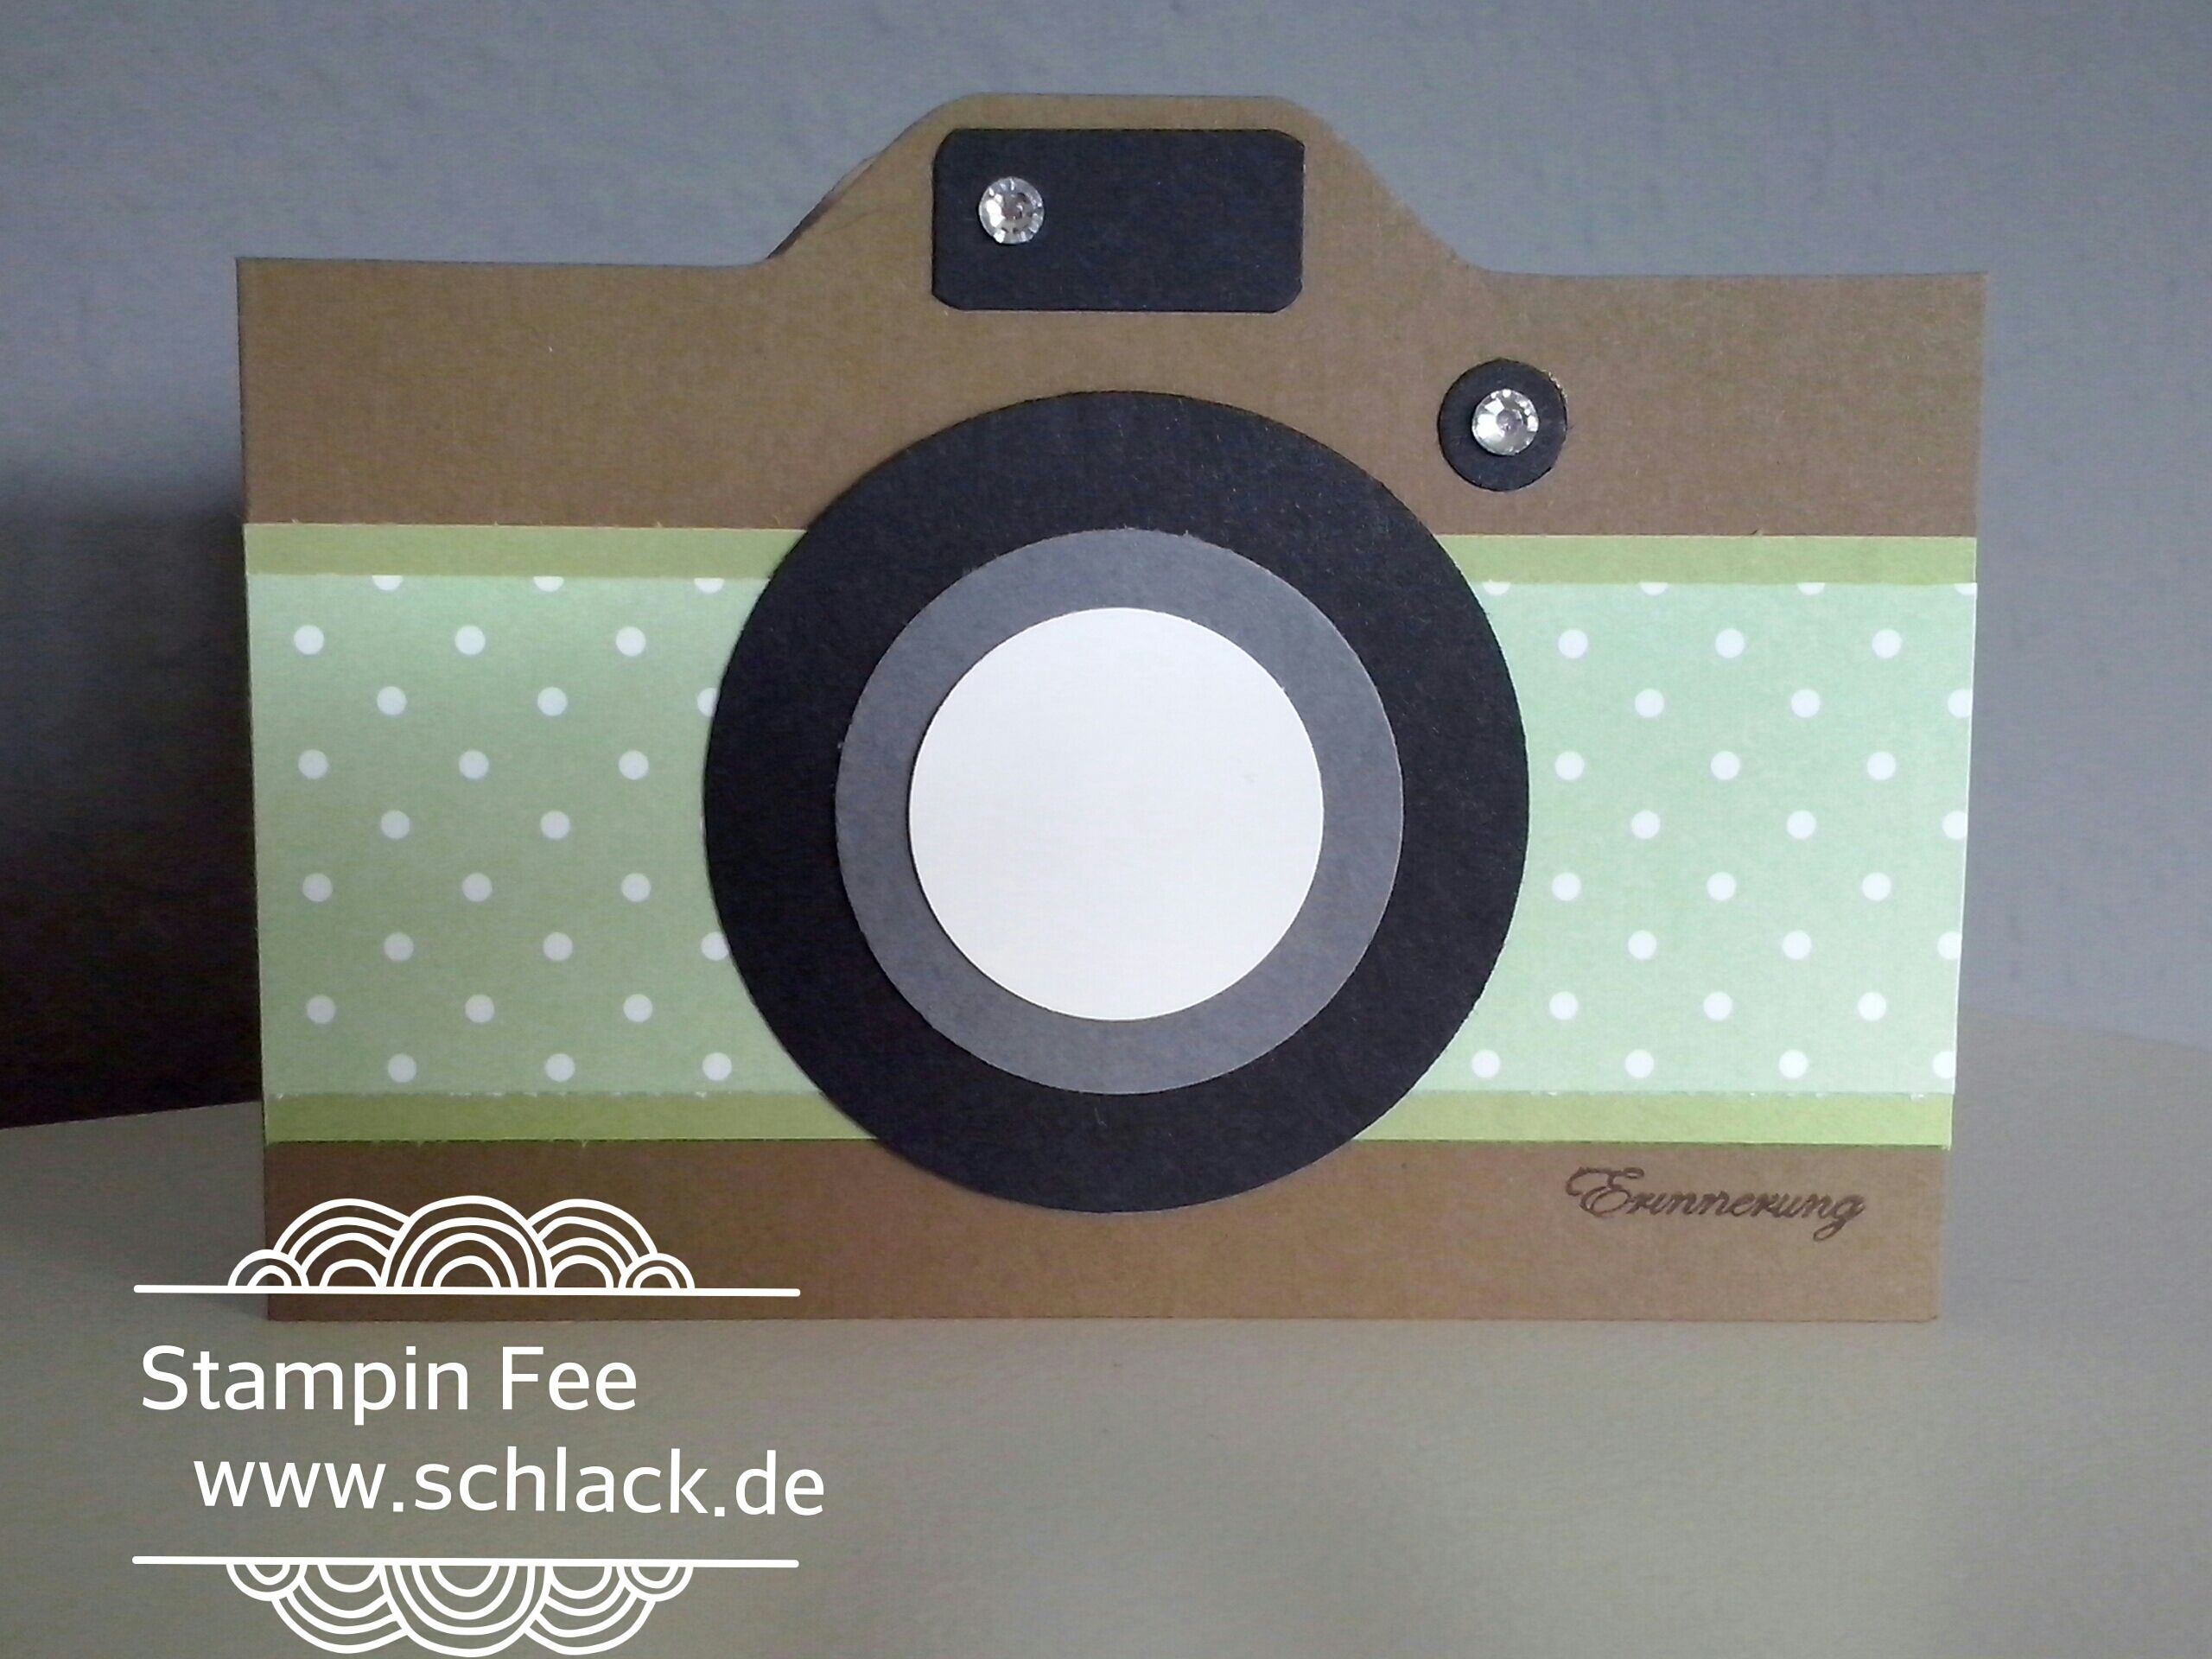 Stampin Up Punch Board Kamera Camera Diy See On Www Schlack De